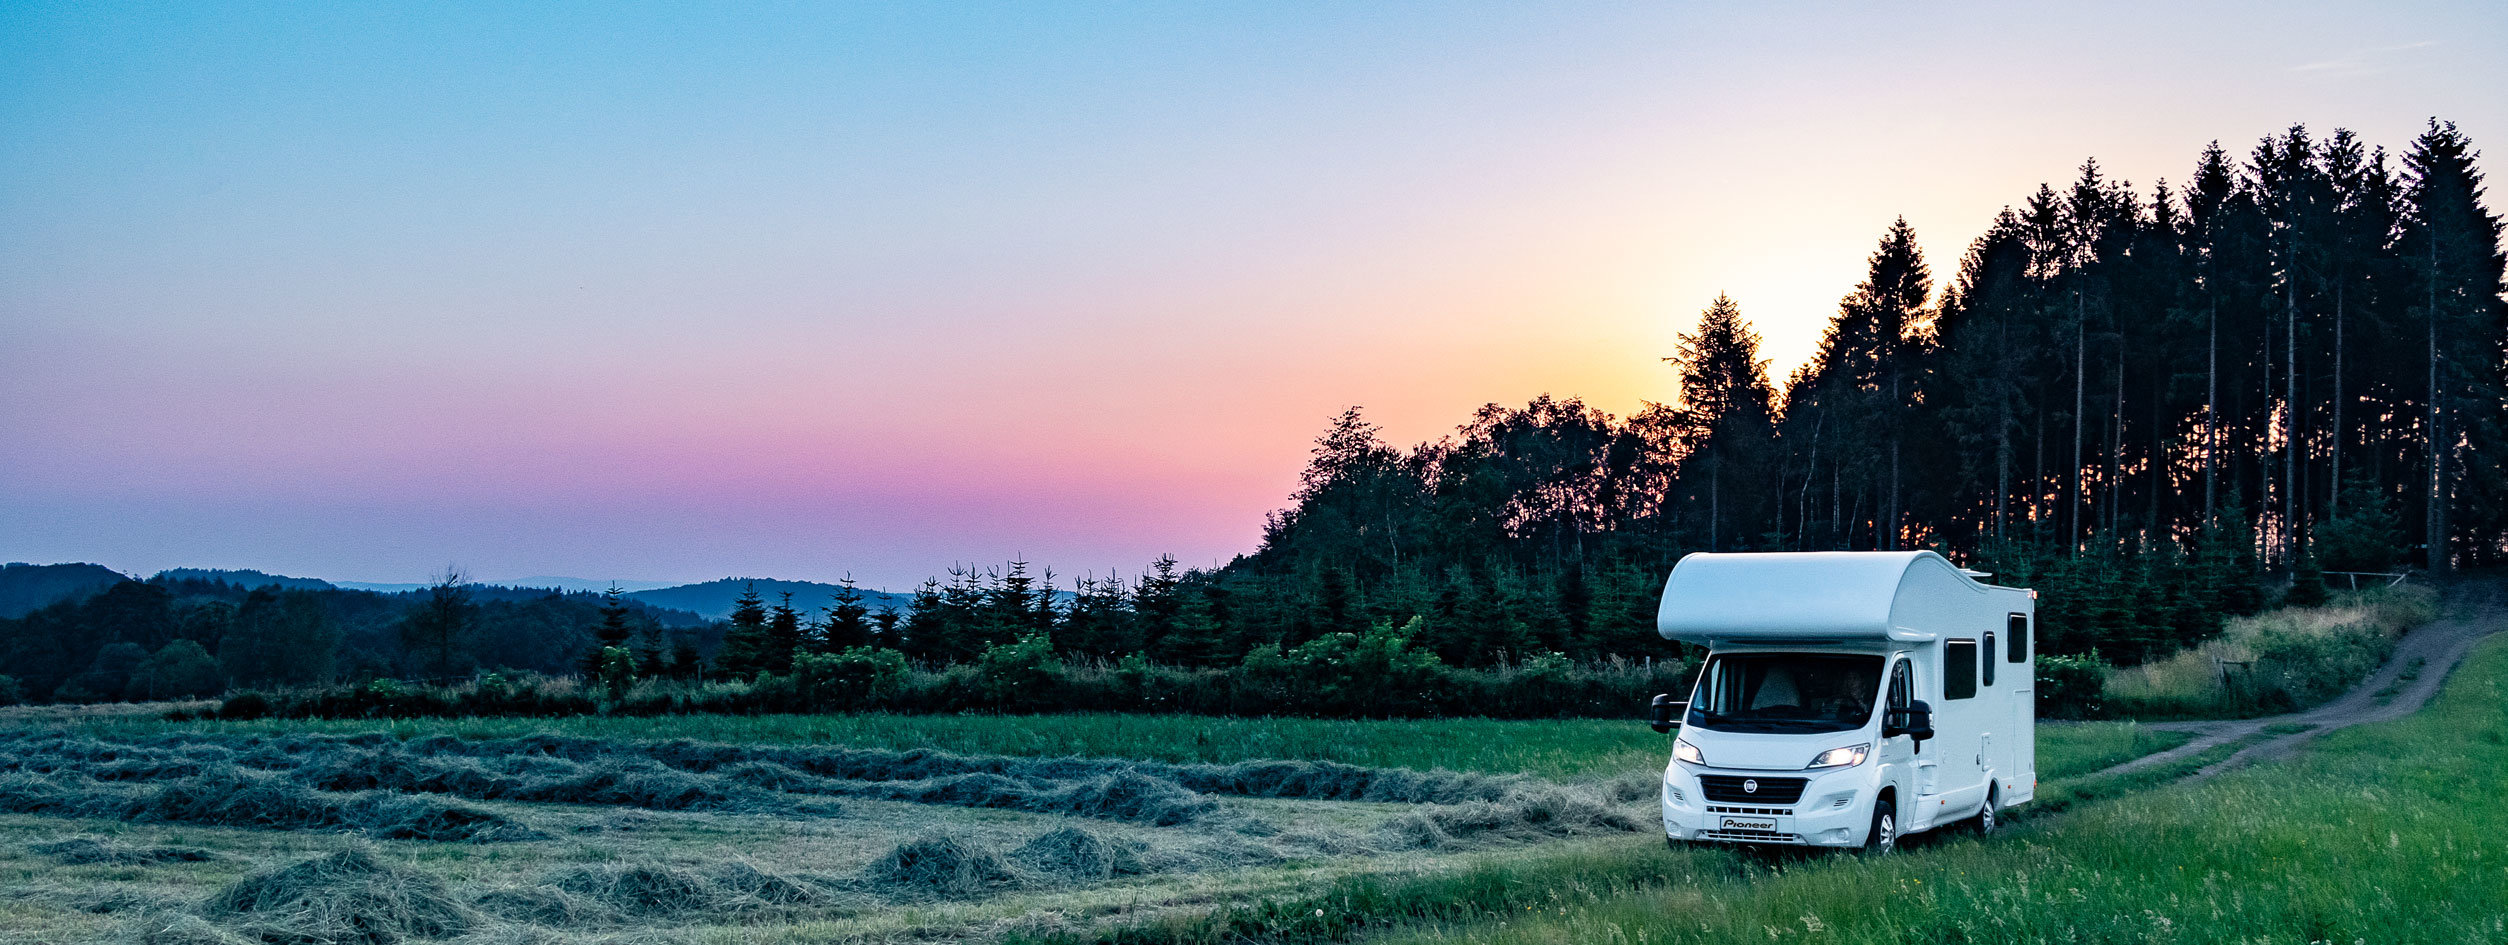 Reisemobil im Oberbergischen vor Abendhimmel